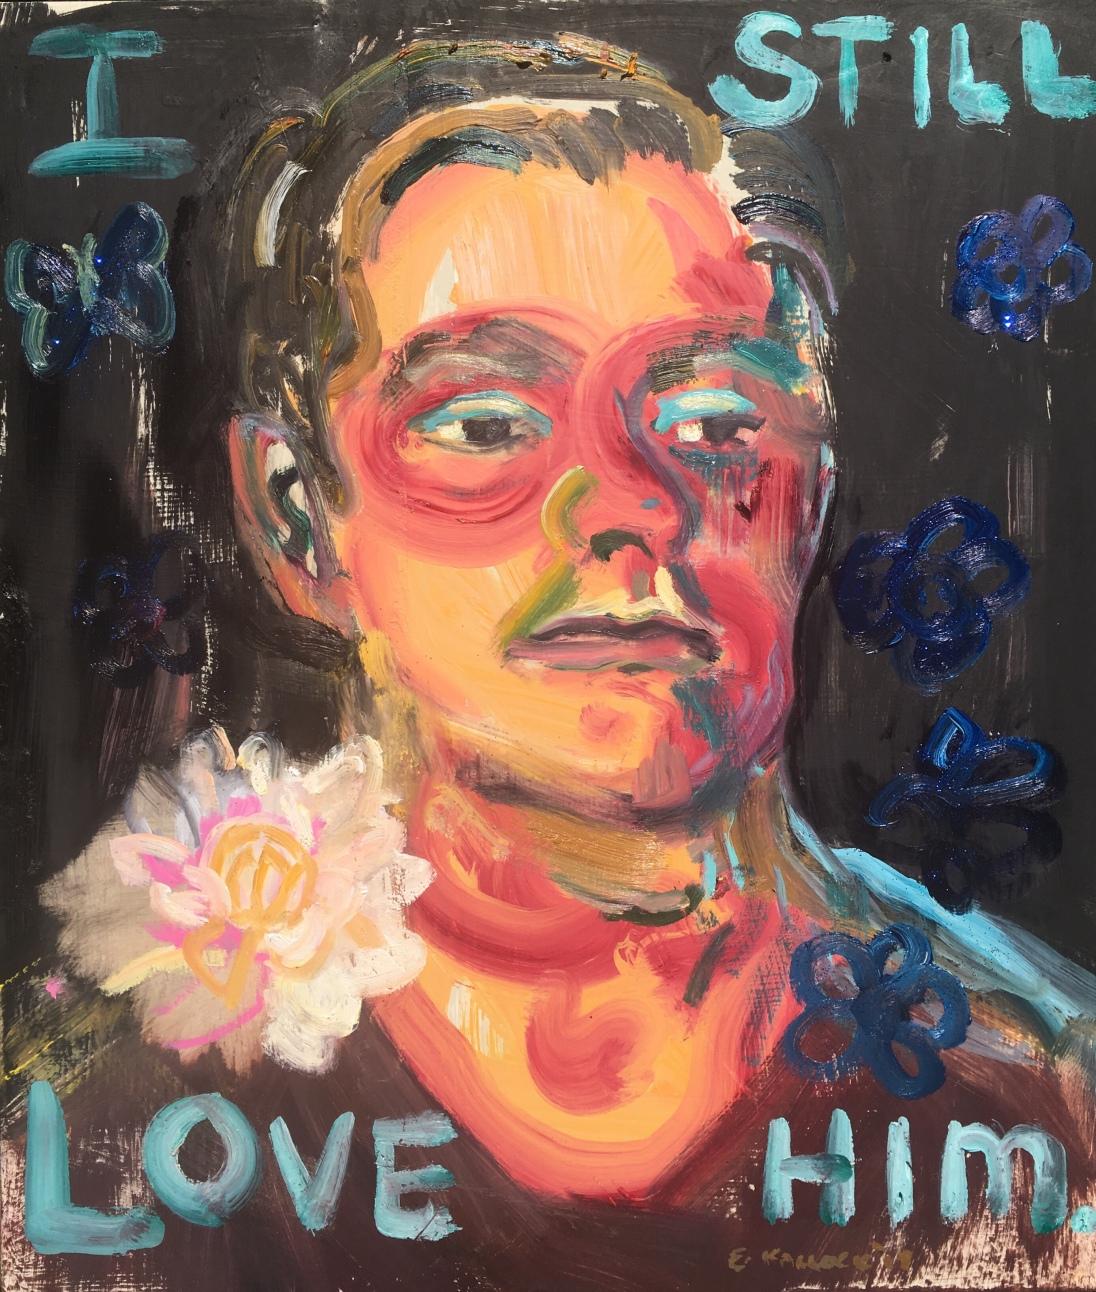 I Still Love Him, oil and glitter on kitchen cabinet door, 20 by 14 in. Emilia Kallock, 2019